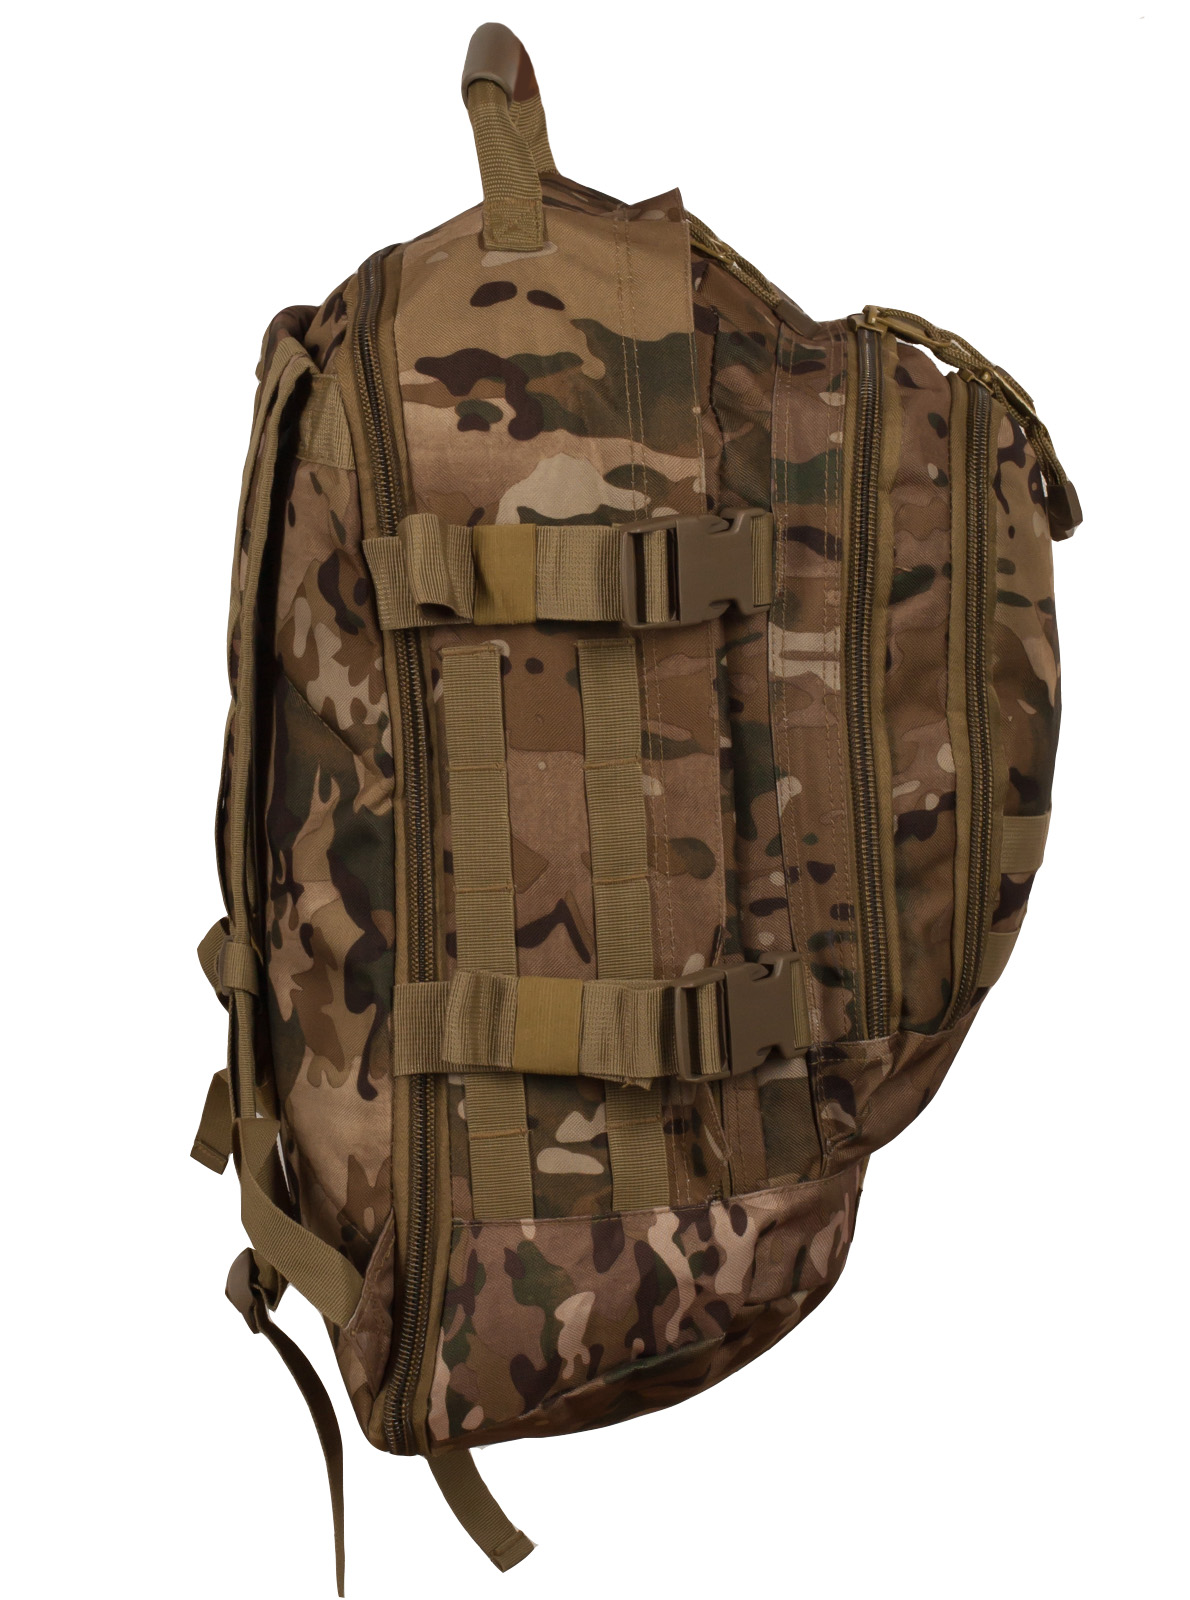 Рейдовый трехдневный рюкзак3-Day Expandable Backpack 08002B Multicam